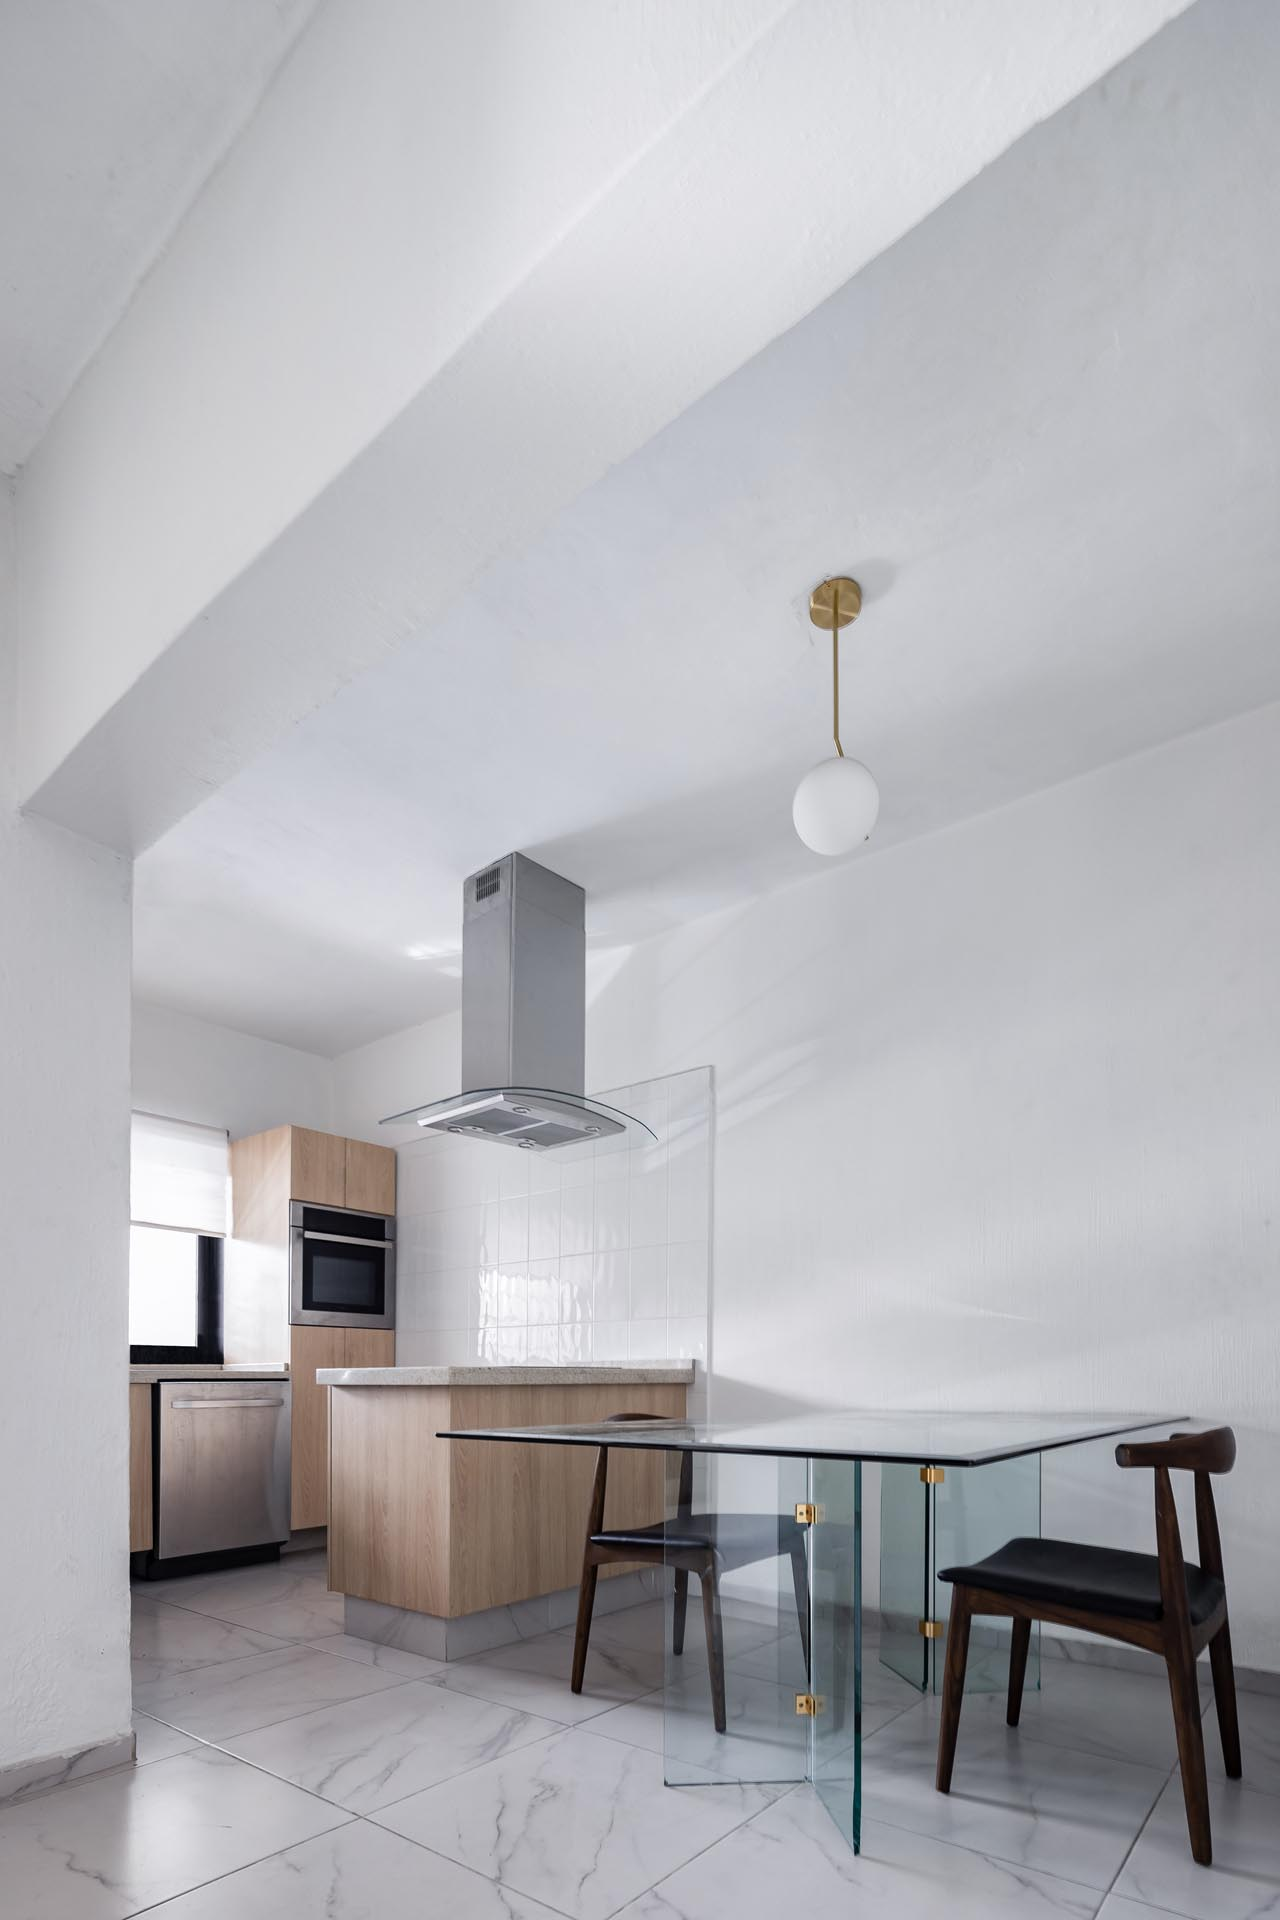 viviendas montes cocina